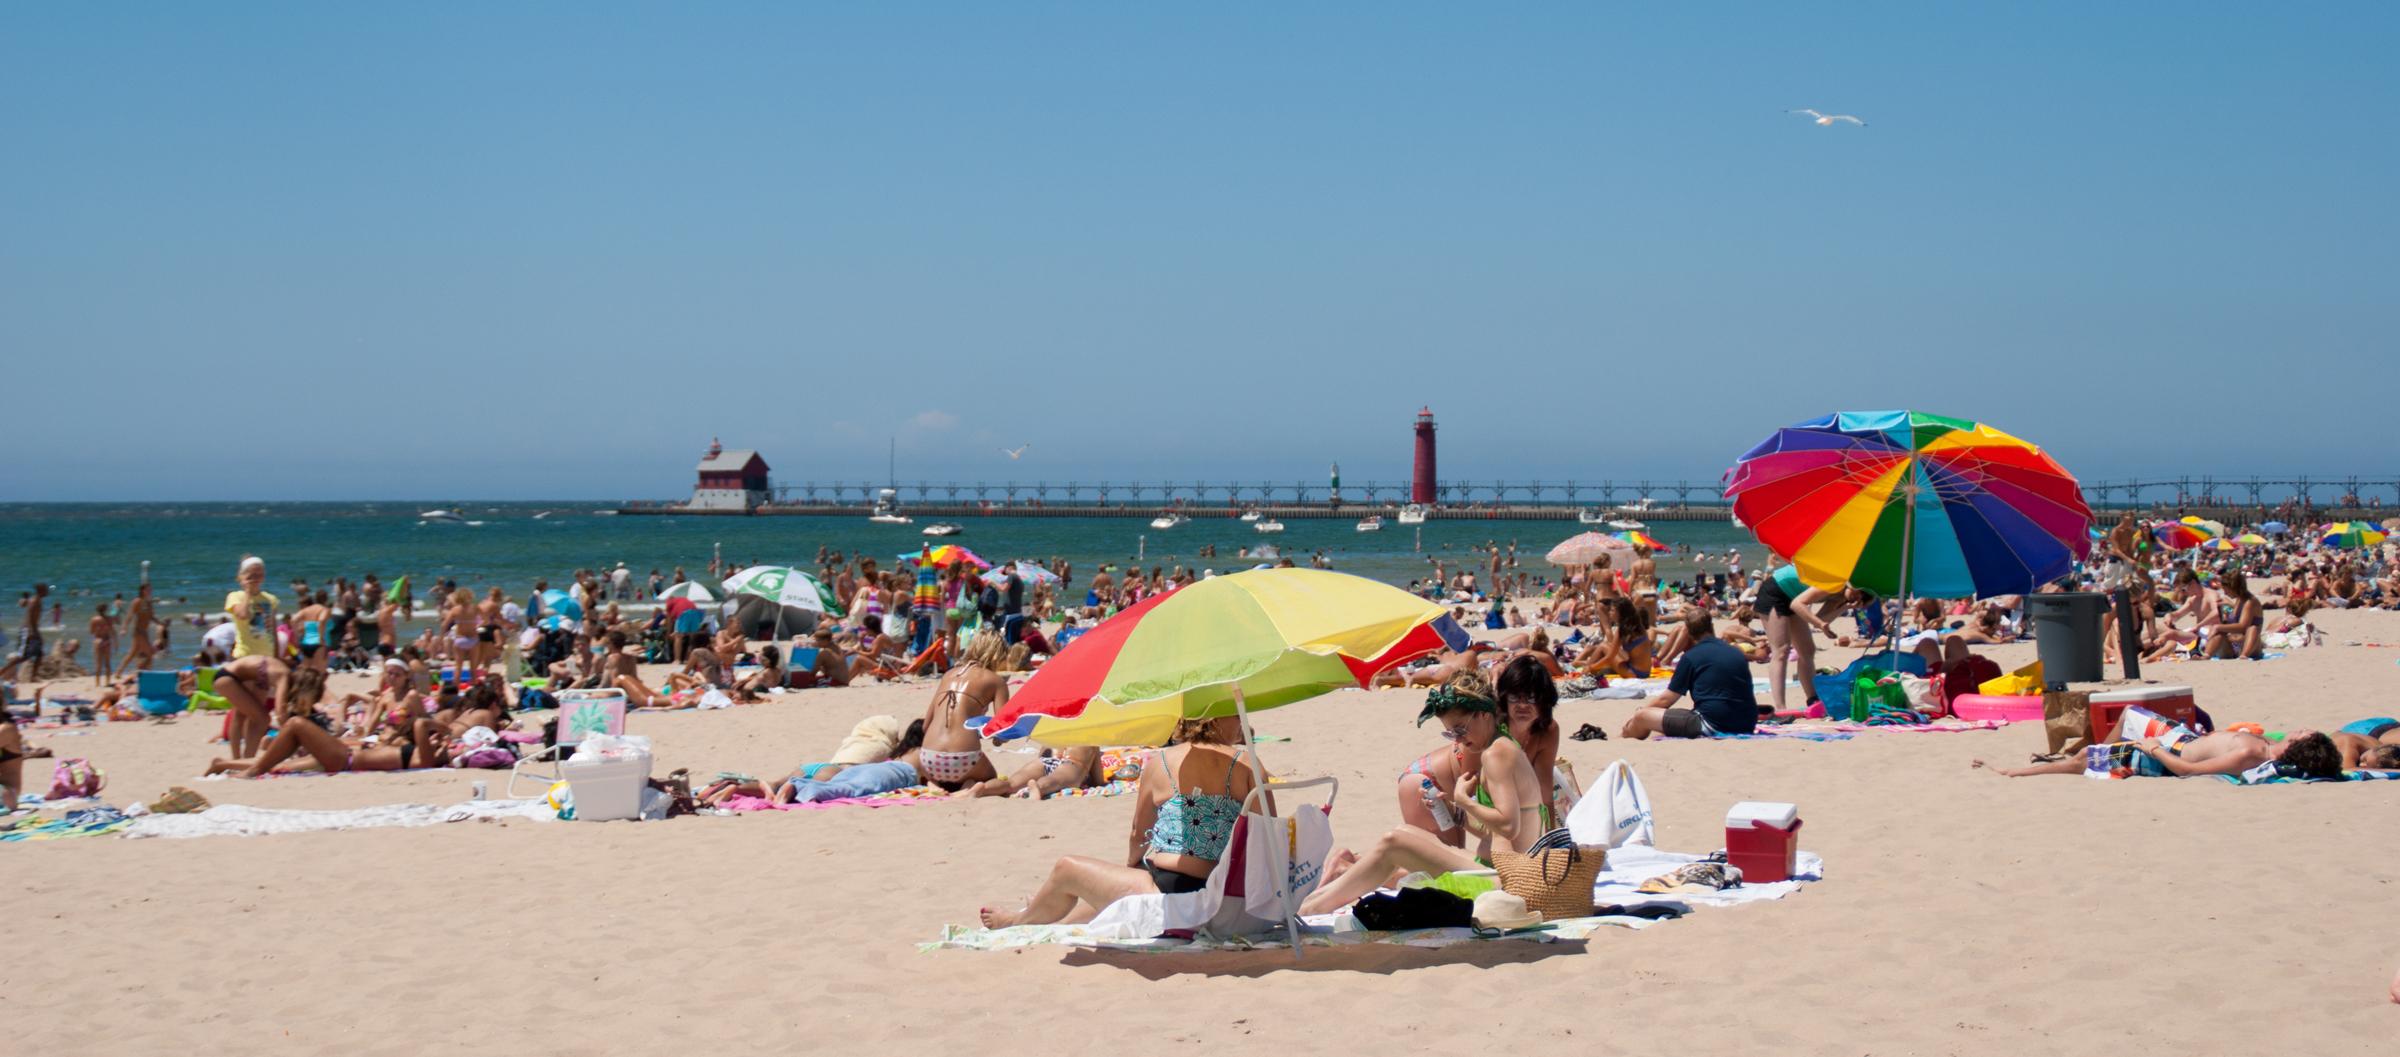 Grand Haven beach. Photo by Marci Cisneros